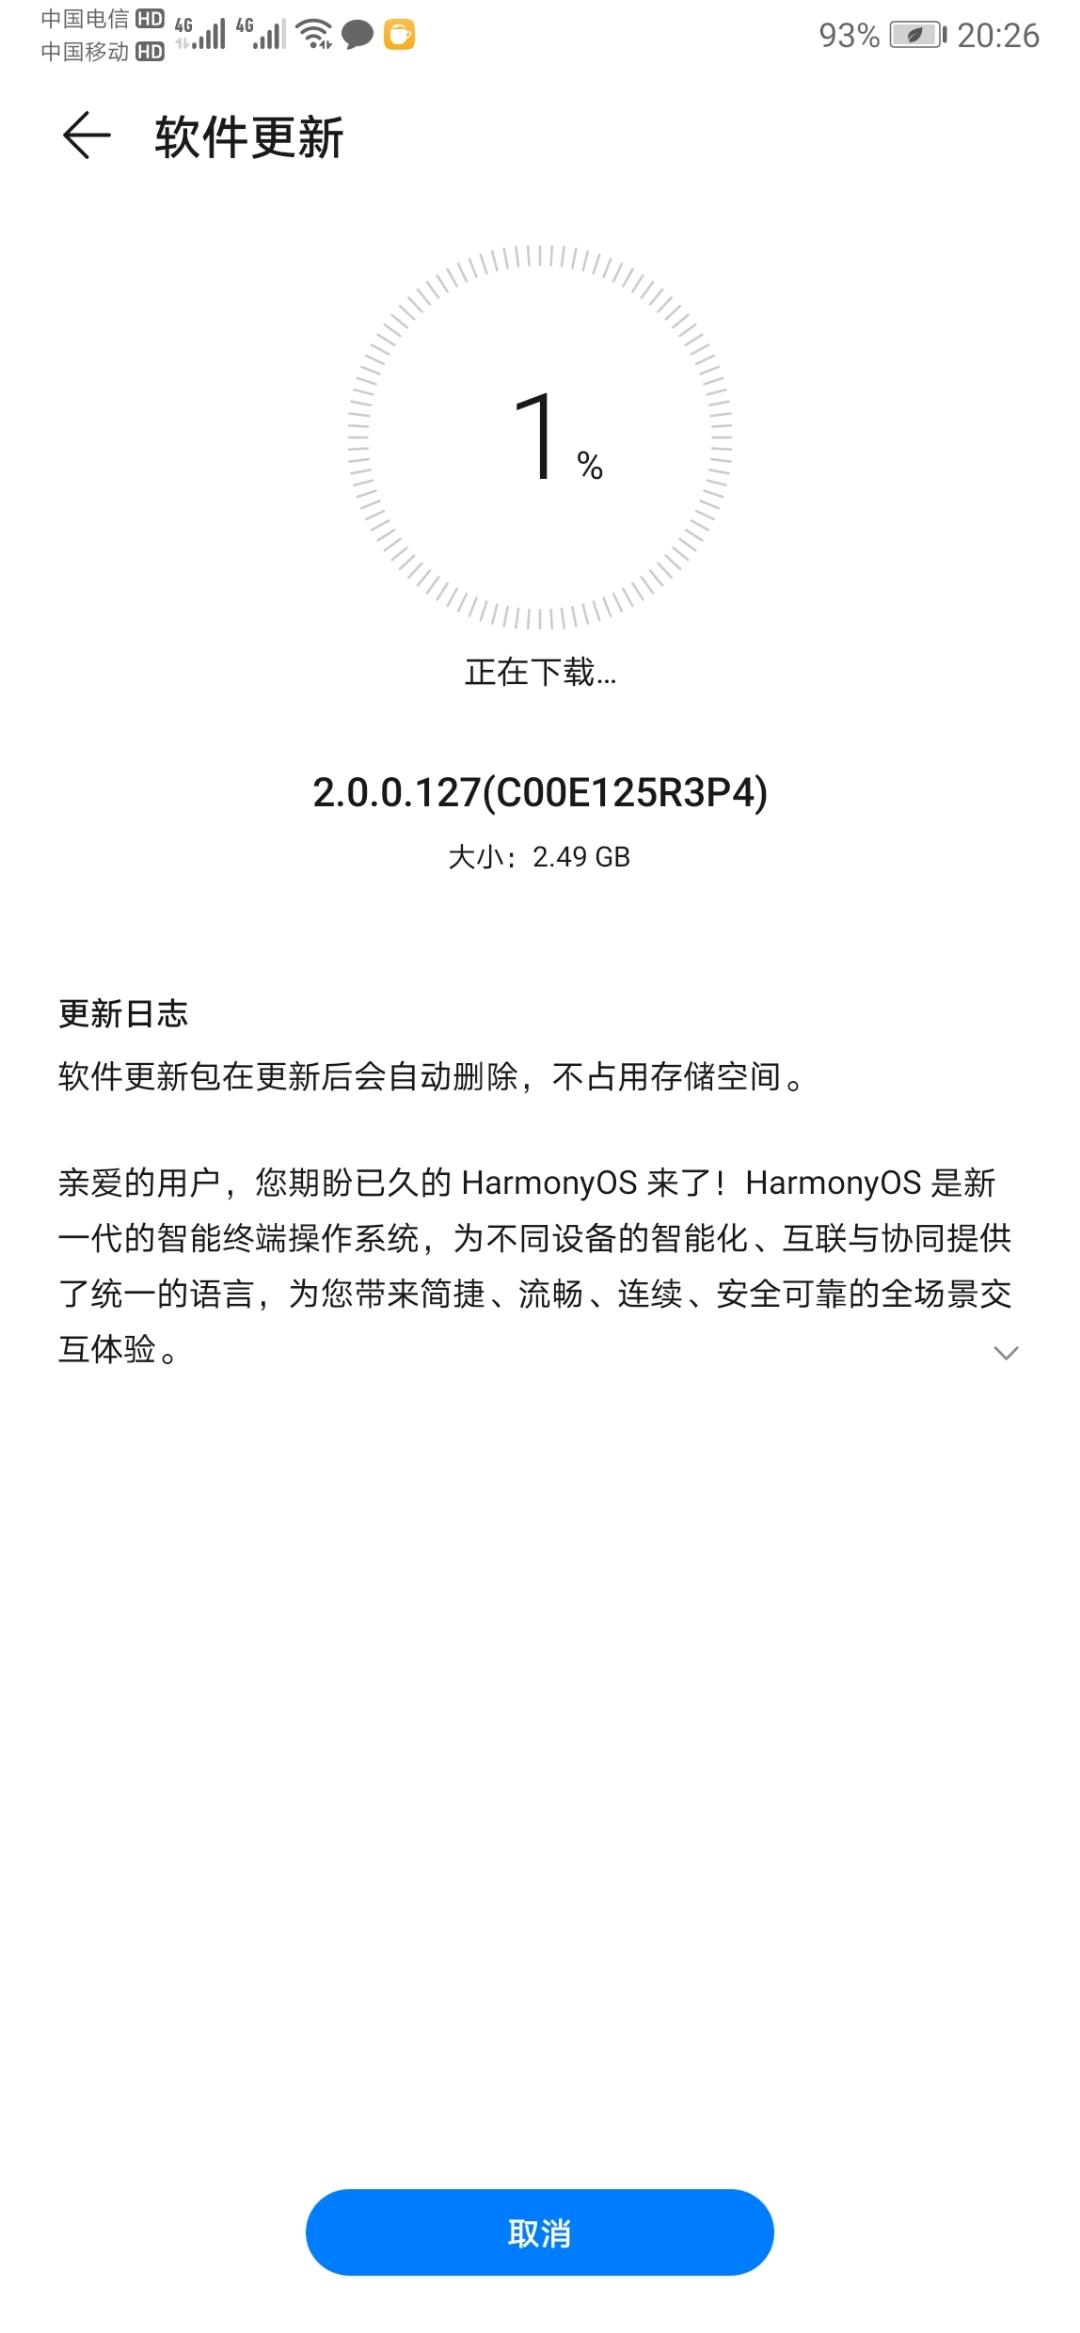 Screenshot_20210617_202636_com.huawei.android.hwouc.jpg